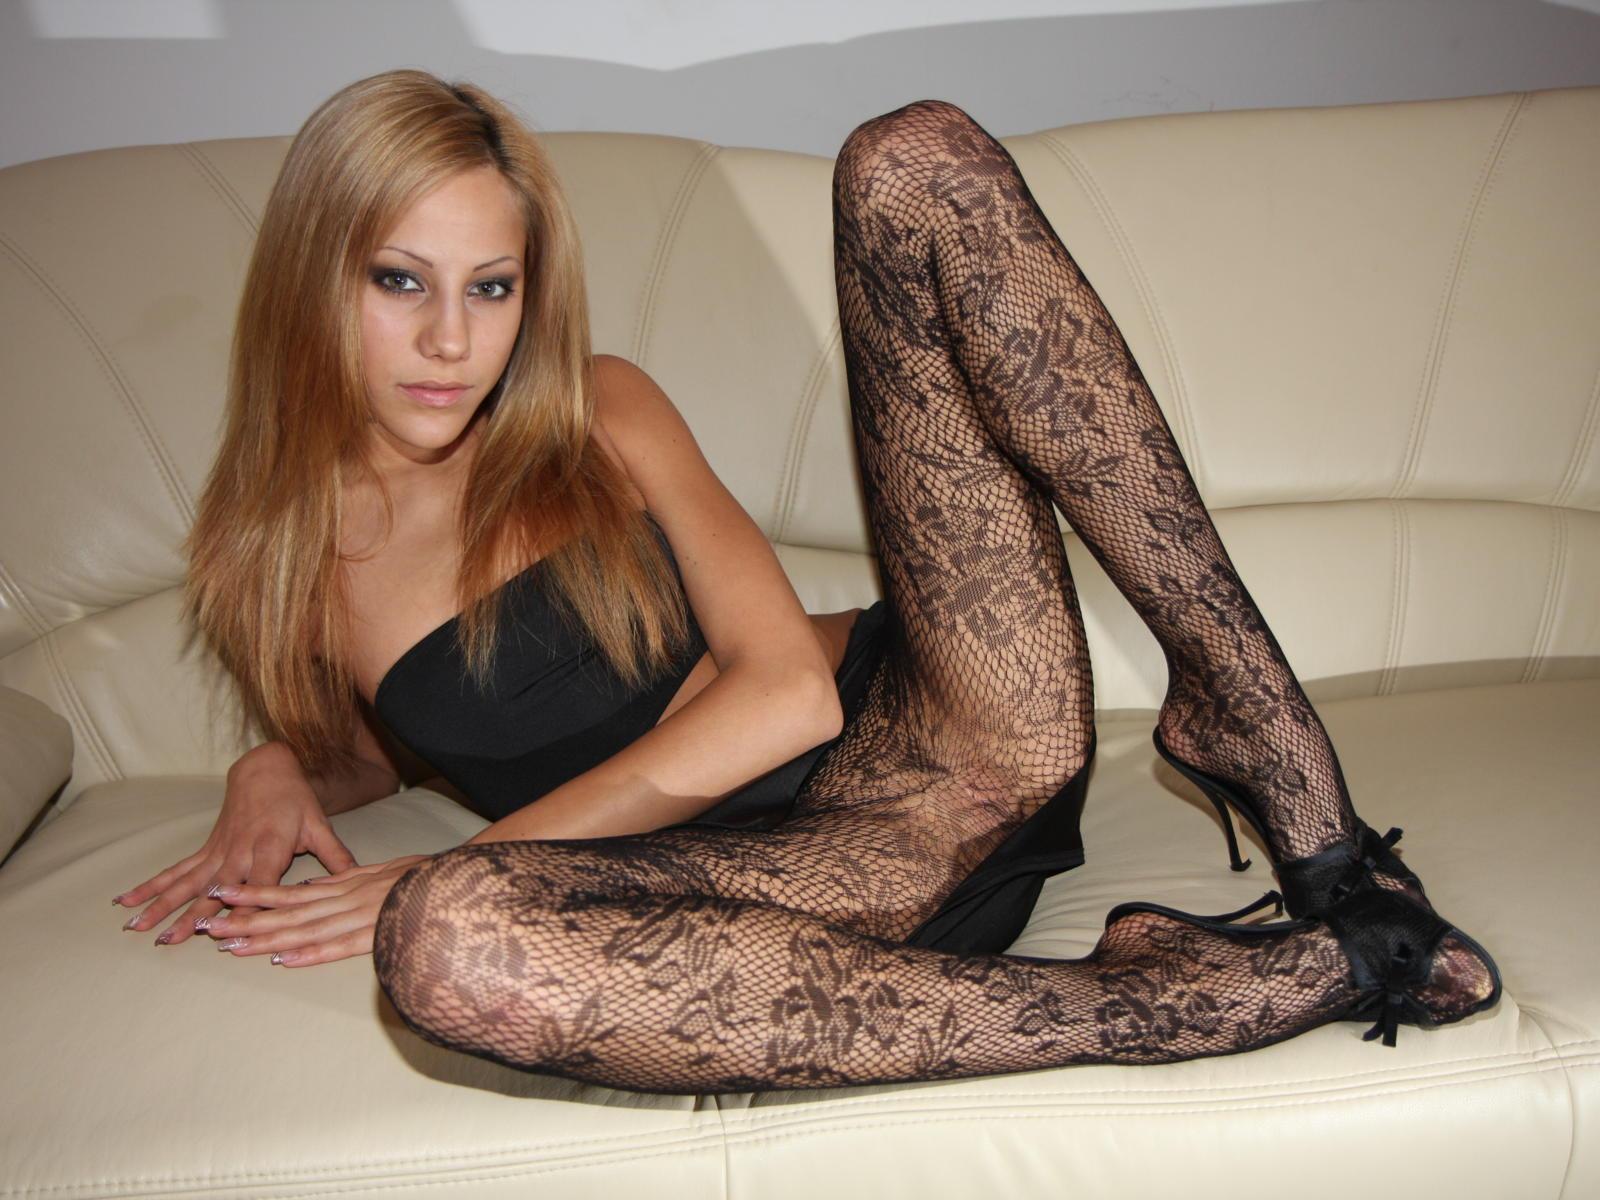 Download photo 3888x2592, anita pearl, spread legs, hi-q